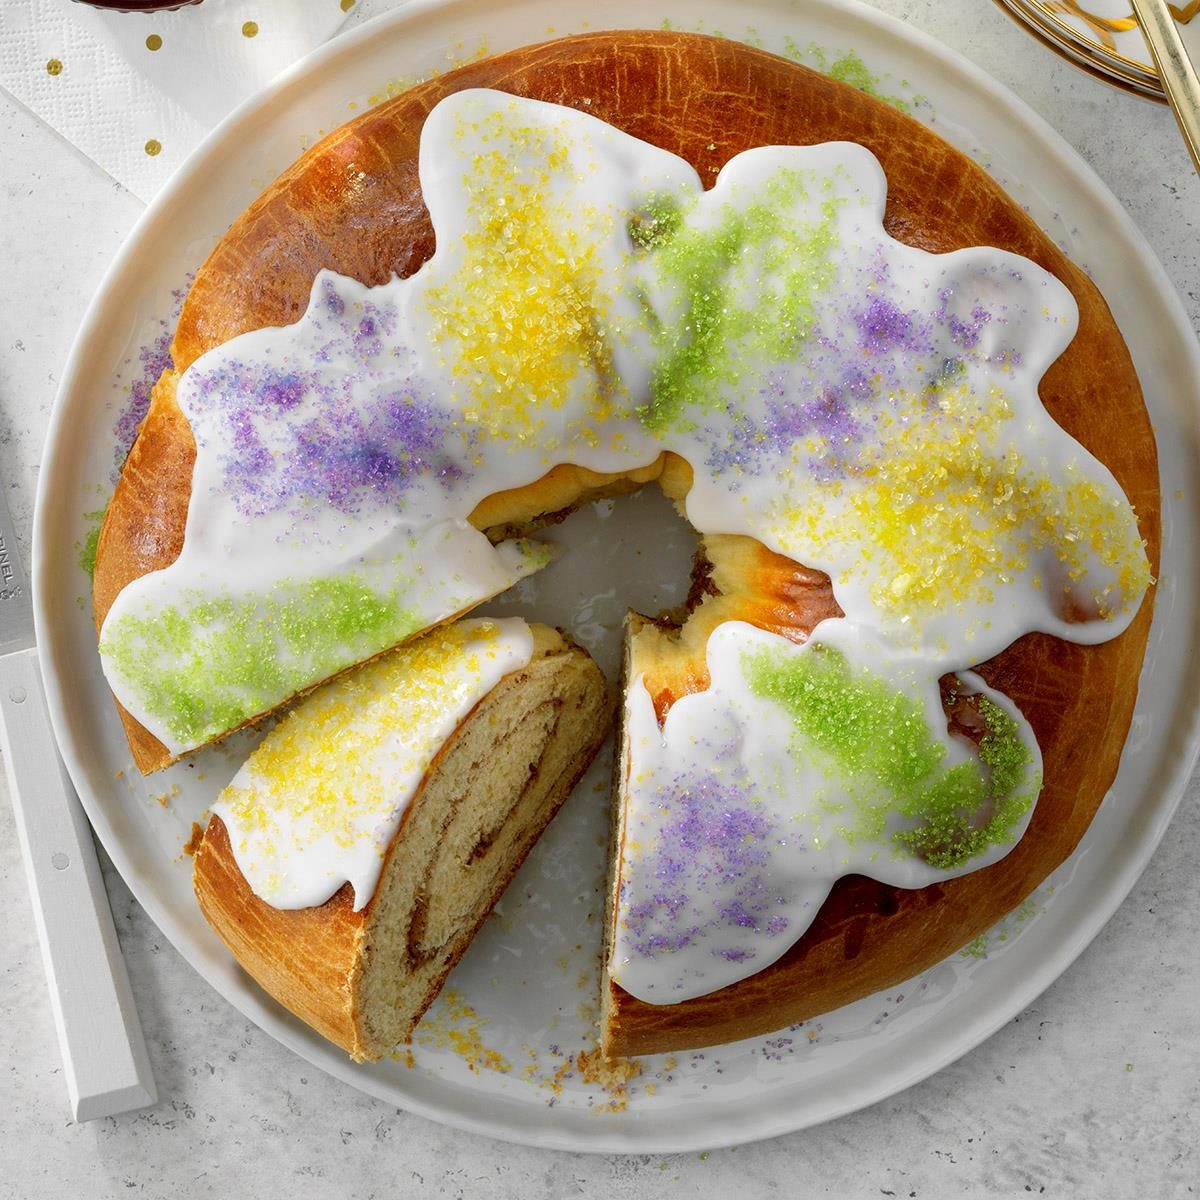 55 New Orleans Recipes For Mardi Gras Taste Of Home